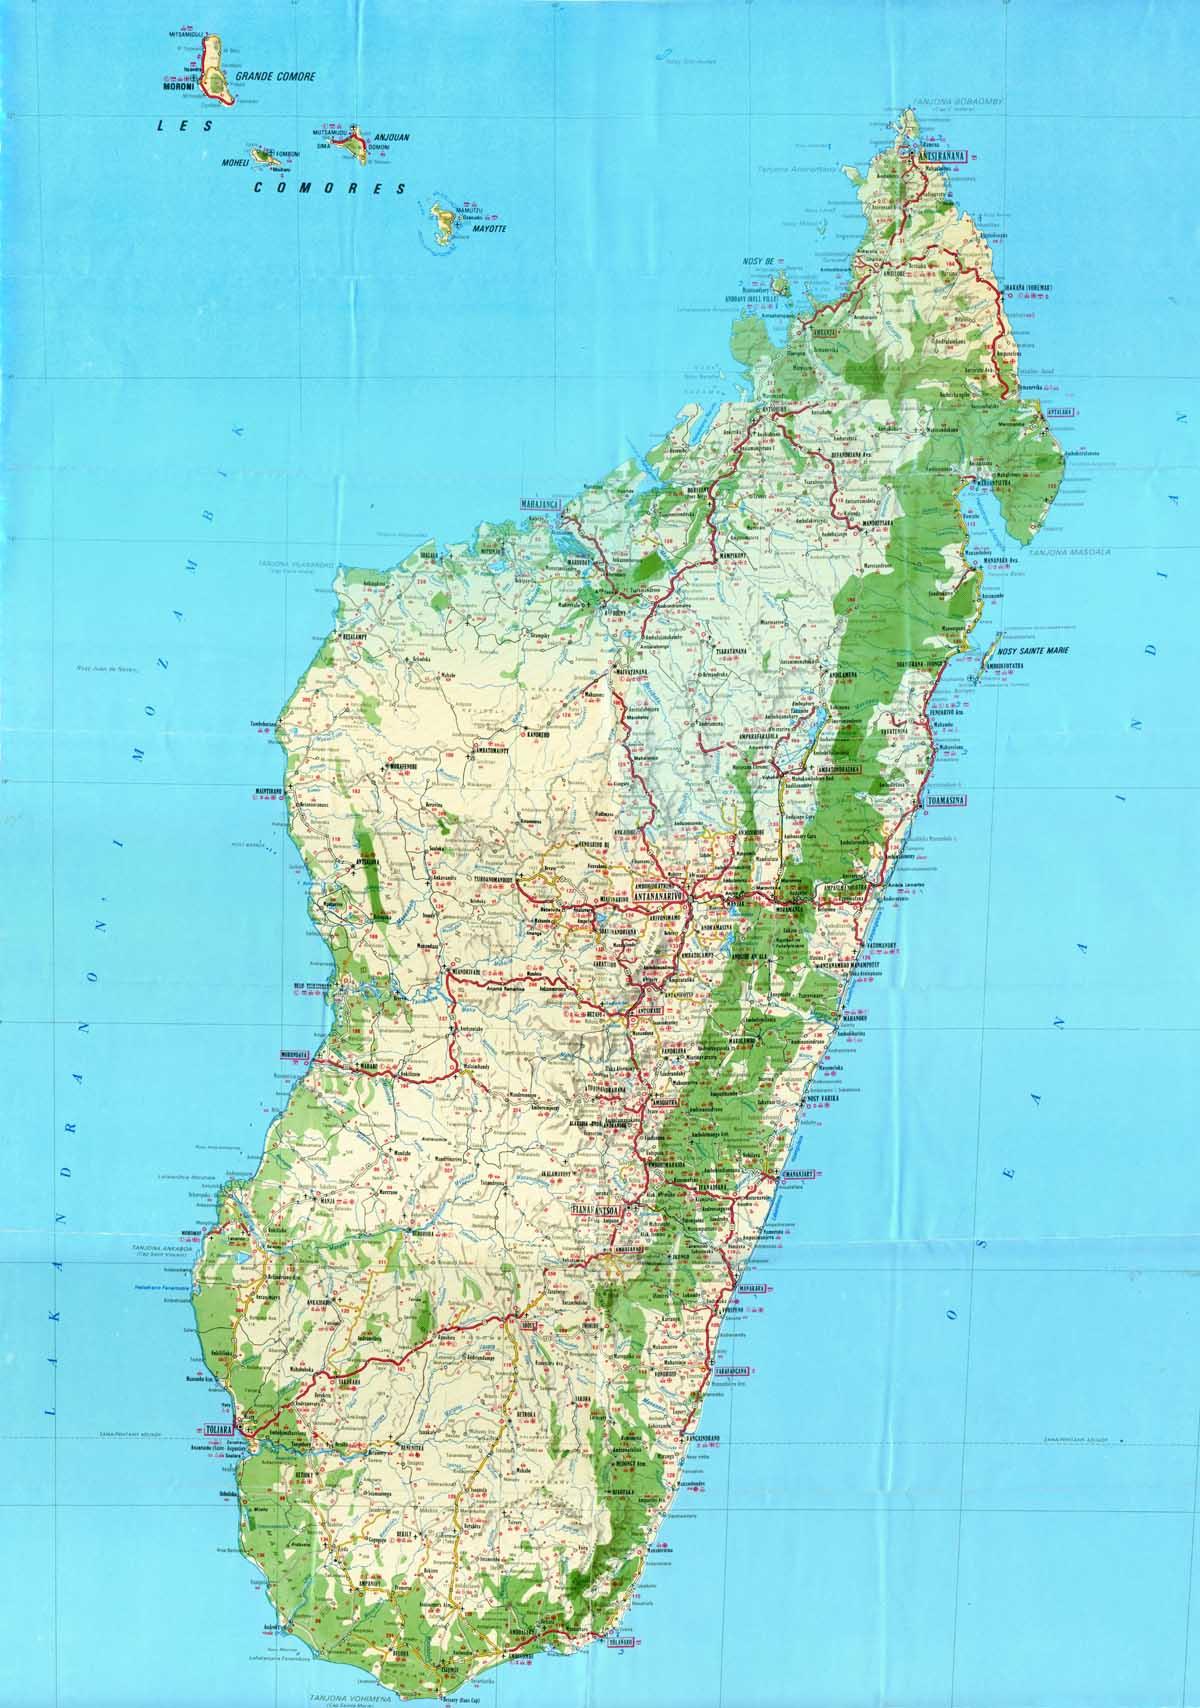 Madagaskar Karte.Worldrecordtour Africa Indian Ocean Madagascar Picture